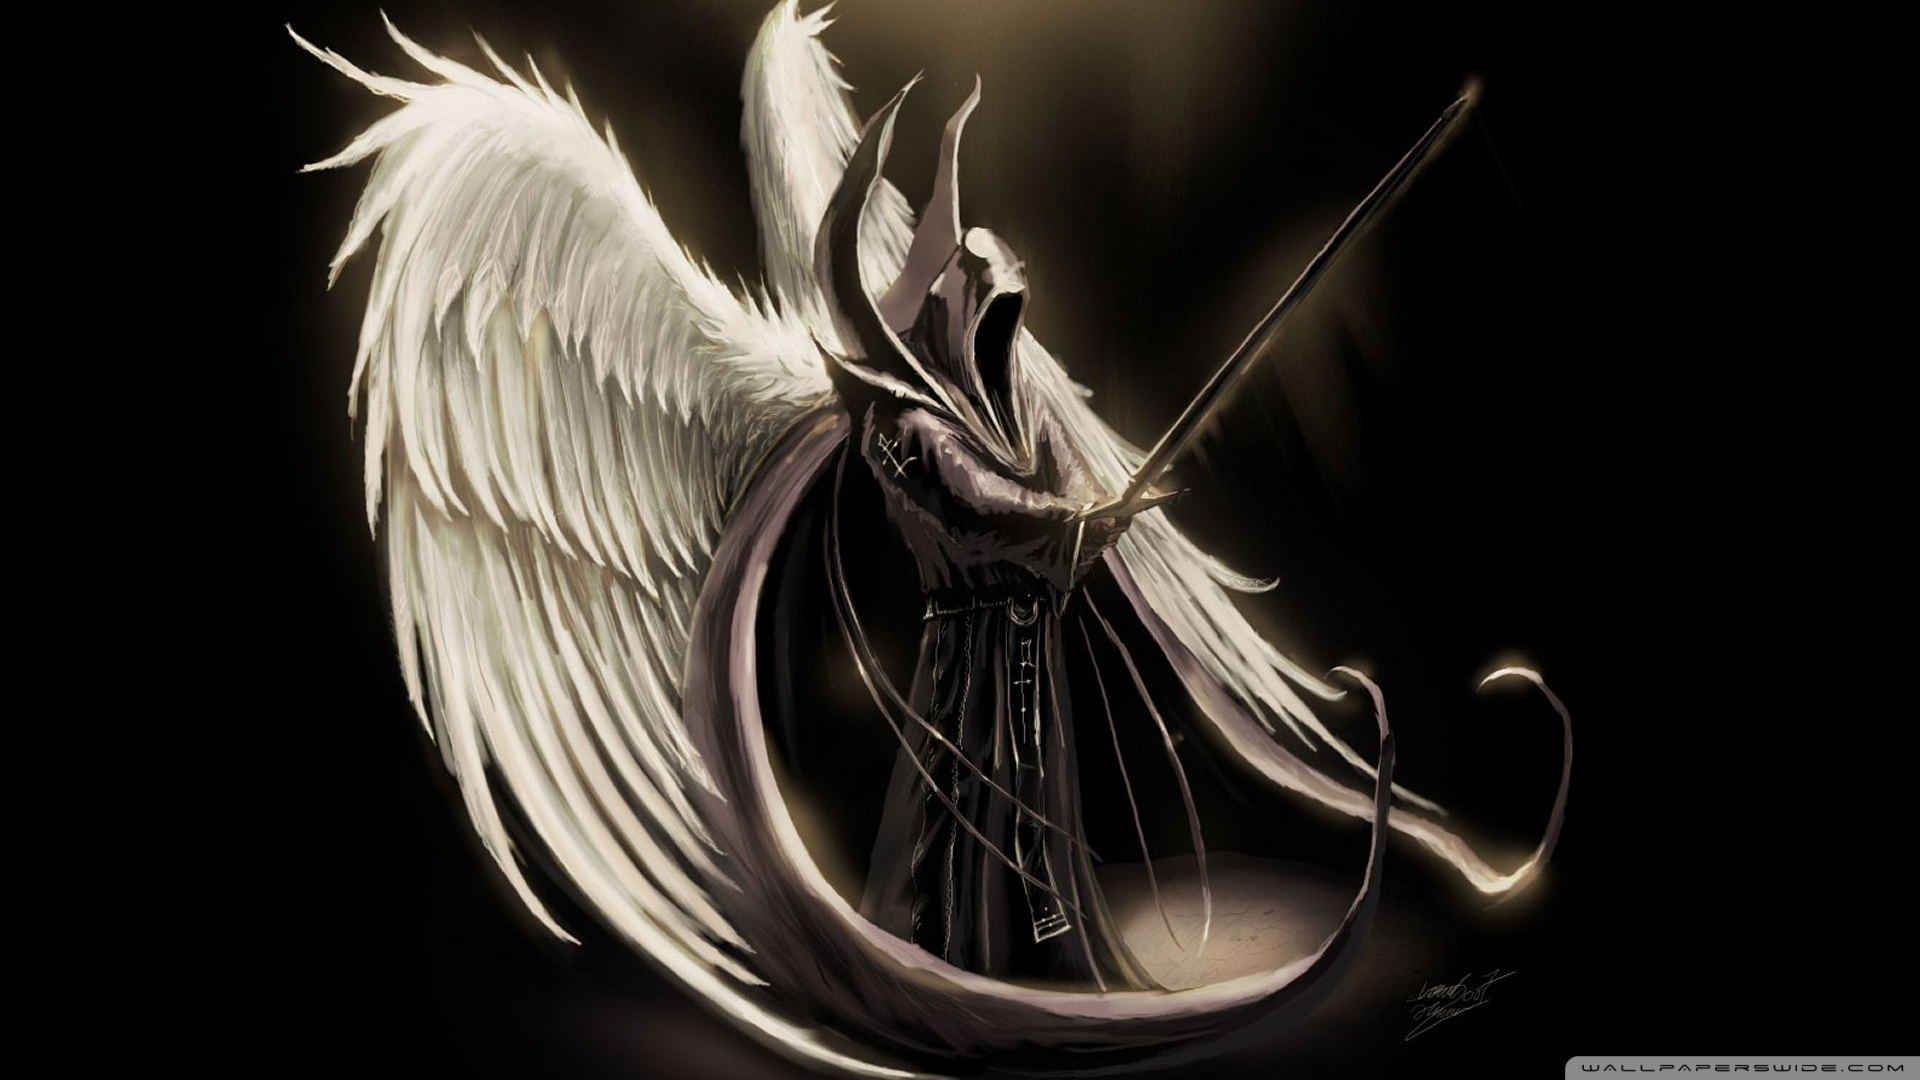 Fallen Angel Art Wallpaper 1920x1080 Fallen Angel Art 1920x1080